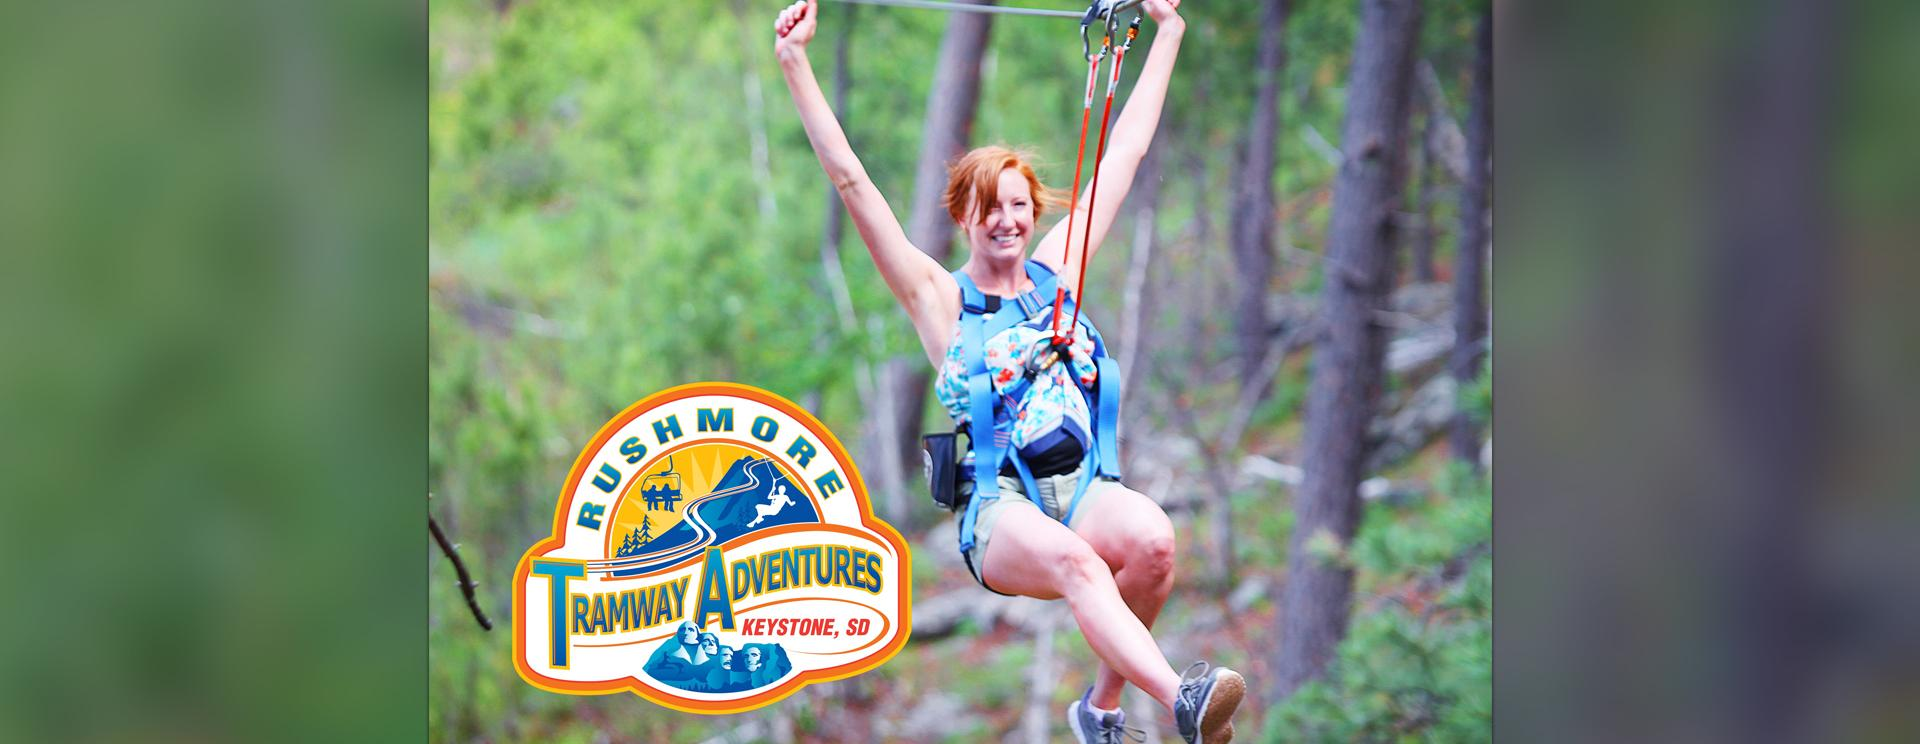 Aerial Adventure Park at Rushmore Tramway Adventures